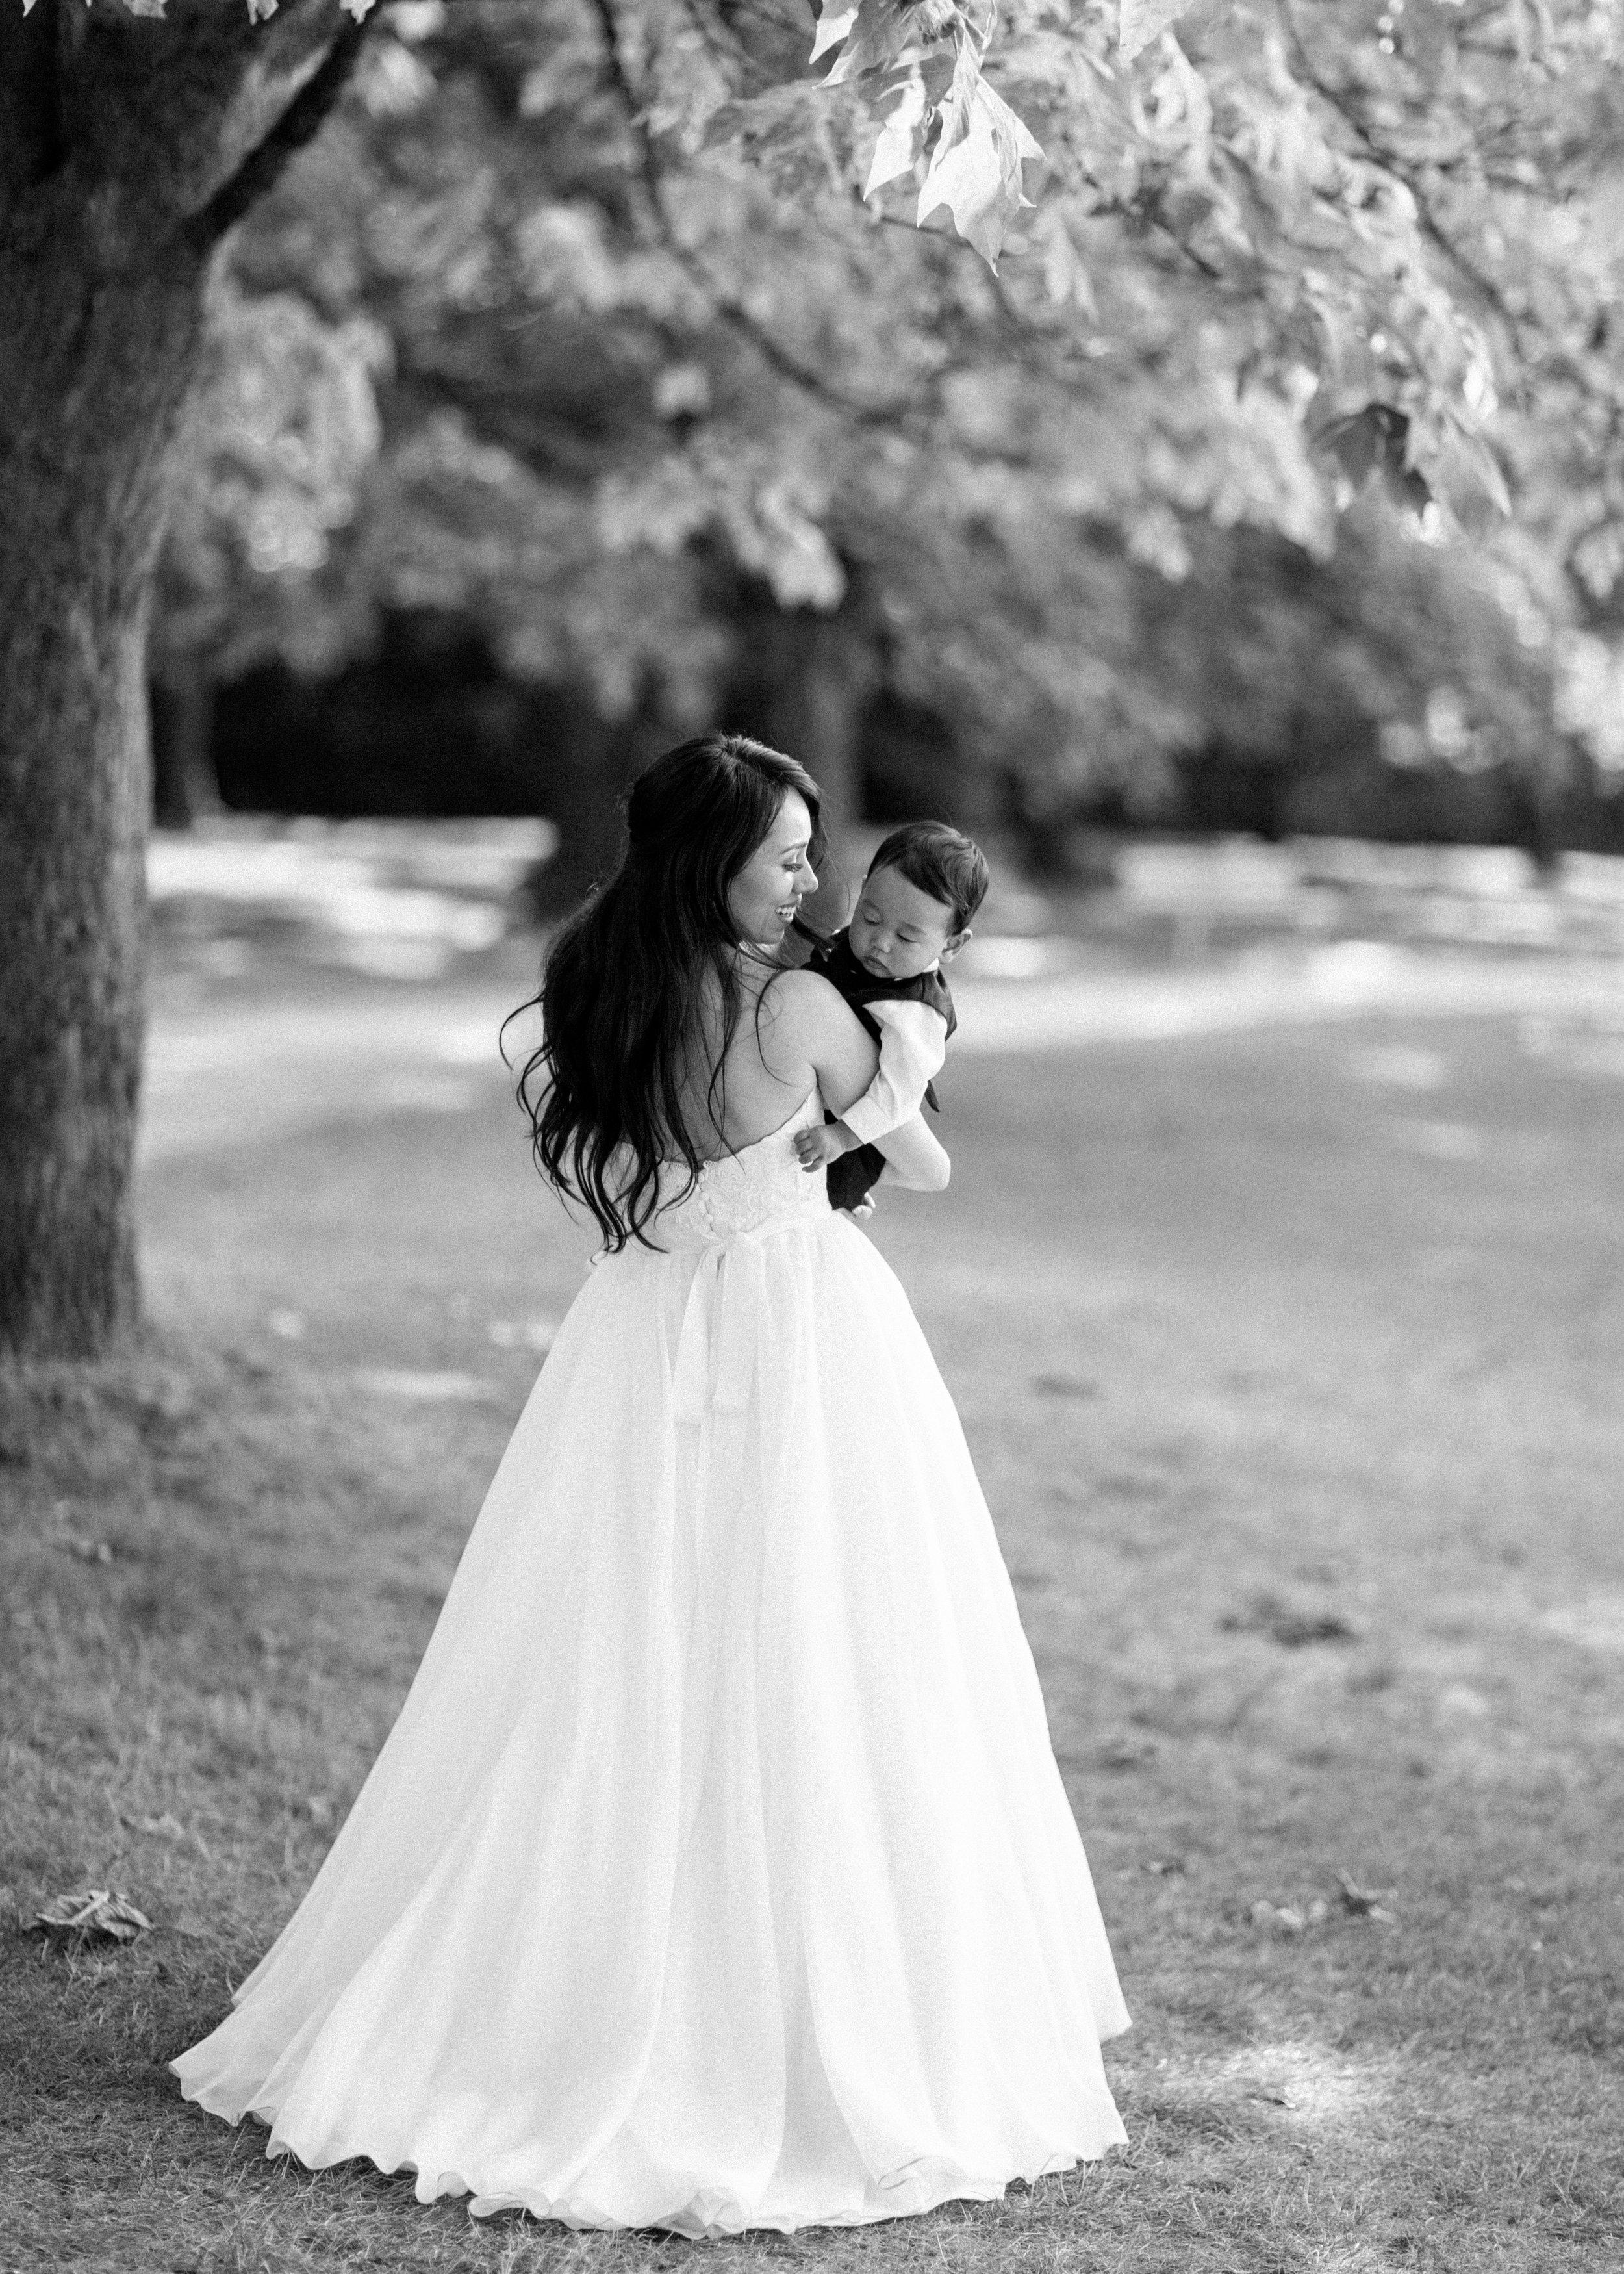 herafilms_wedding_priscilla_adrian_hera_selects-38.jpg